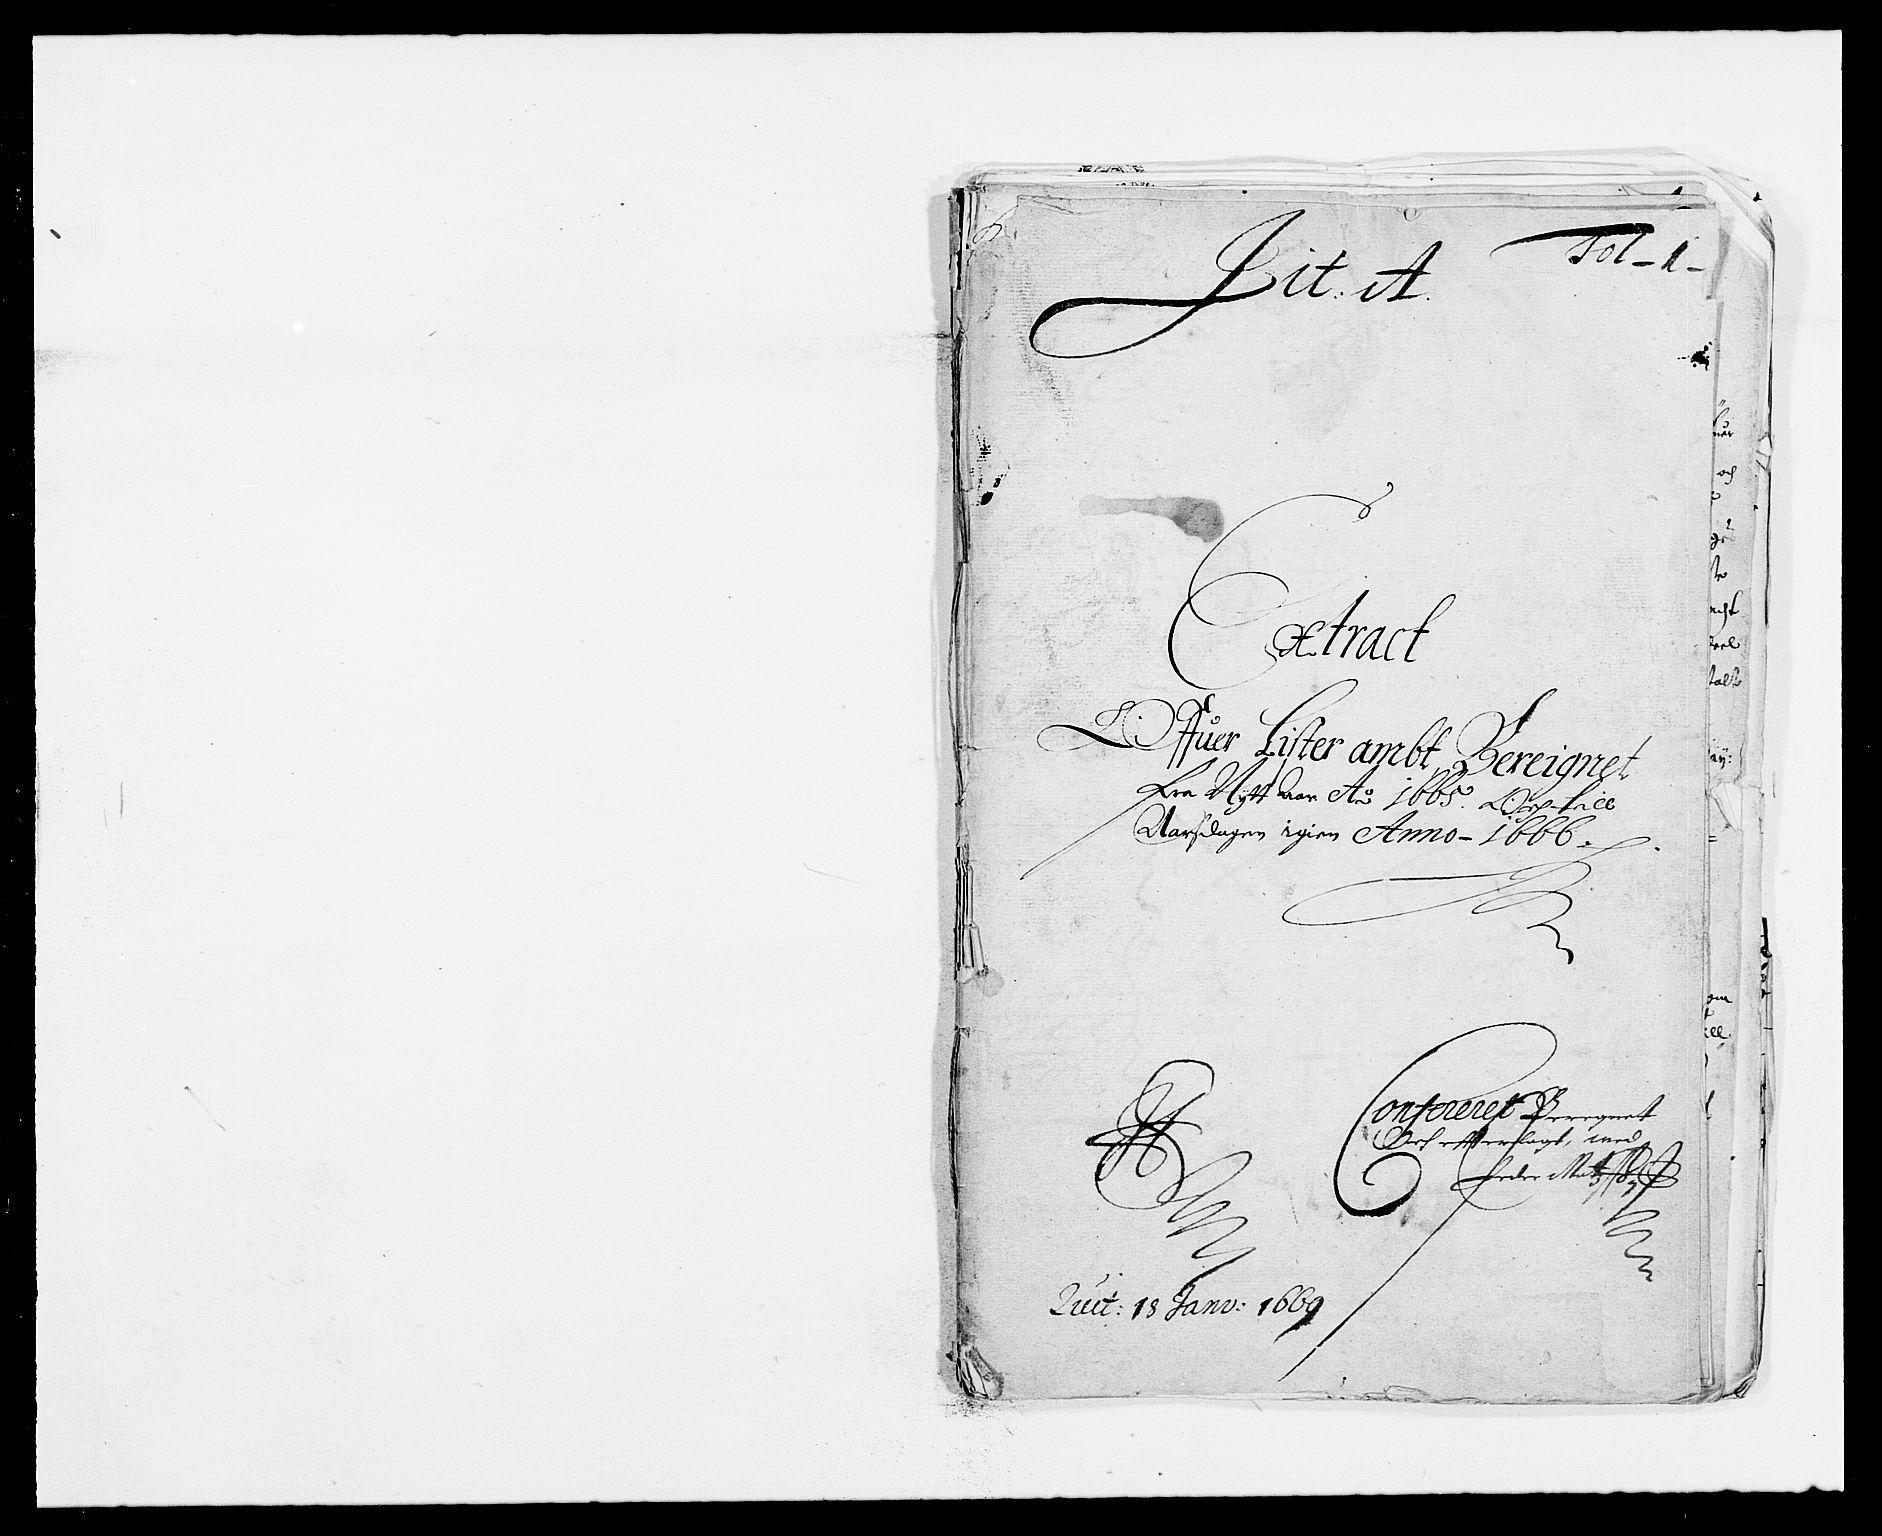 RA, Rentekammeret inntil 1814, Reviderte regnskaper, Fogderegnskap, R41/L2524: Fogderegnskap Lista, 1665-1668, s. 1